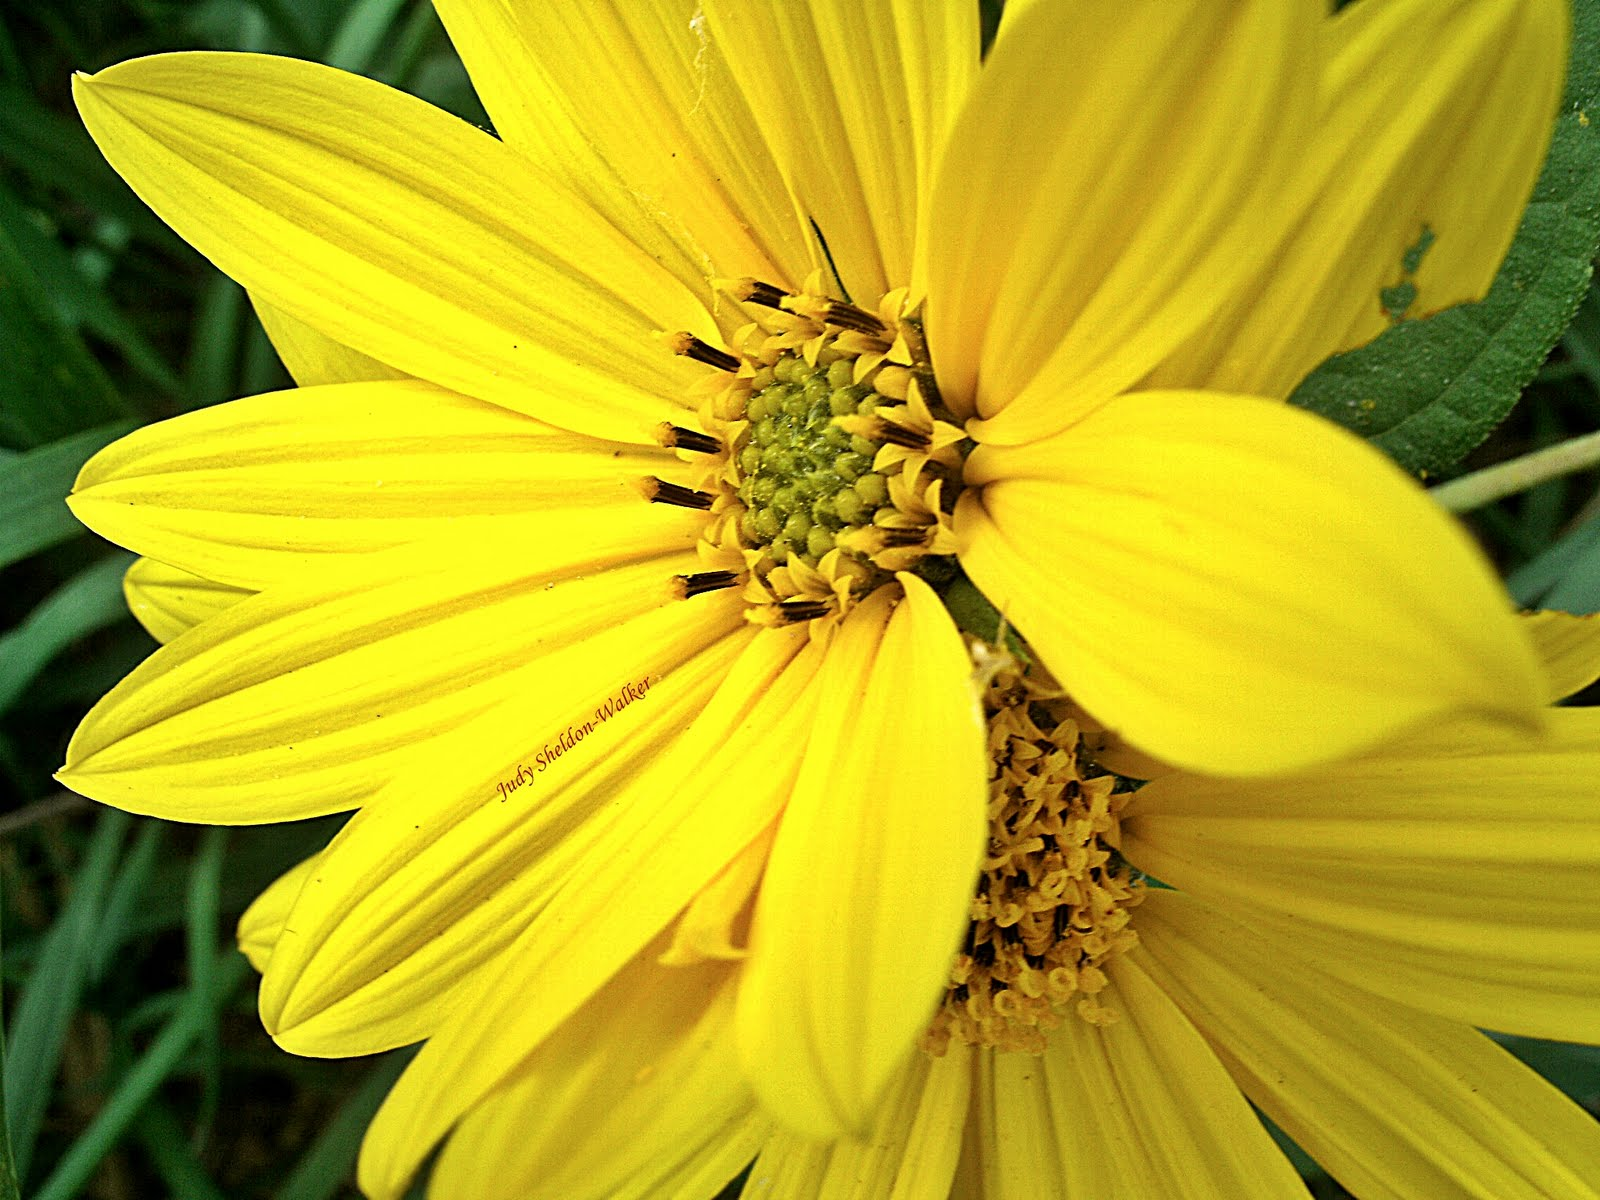 http://4.bp.blogspot.com/_0O6DPq1szOI/TJa81M0jVpI/AAAAAAAADUg/WIX66c3hJYo/s1600/yellow%20flowers.jpg